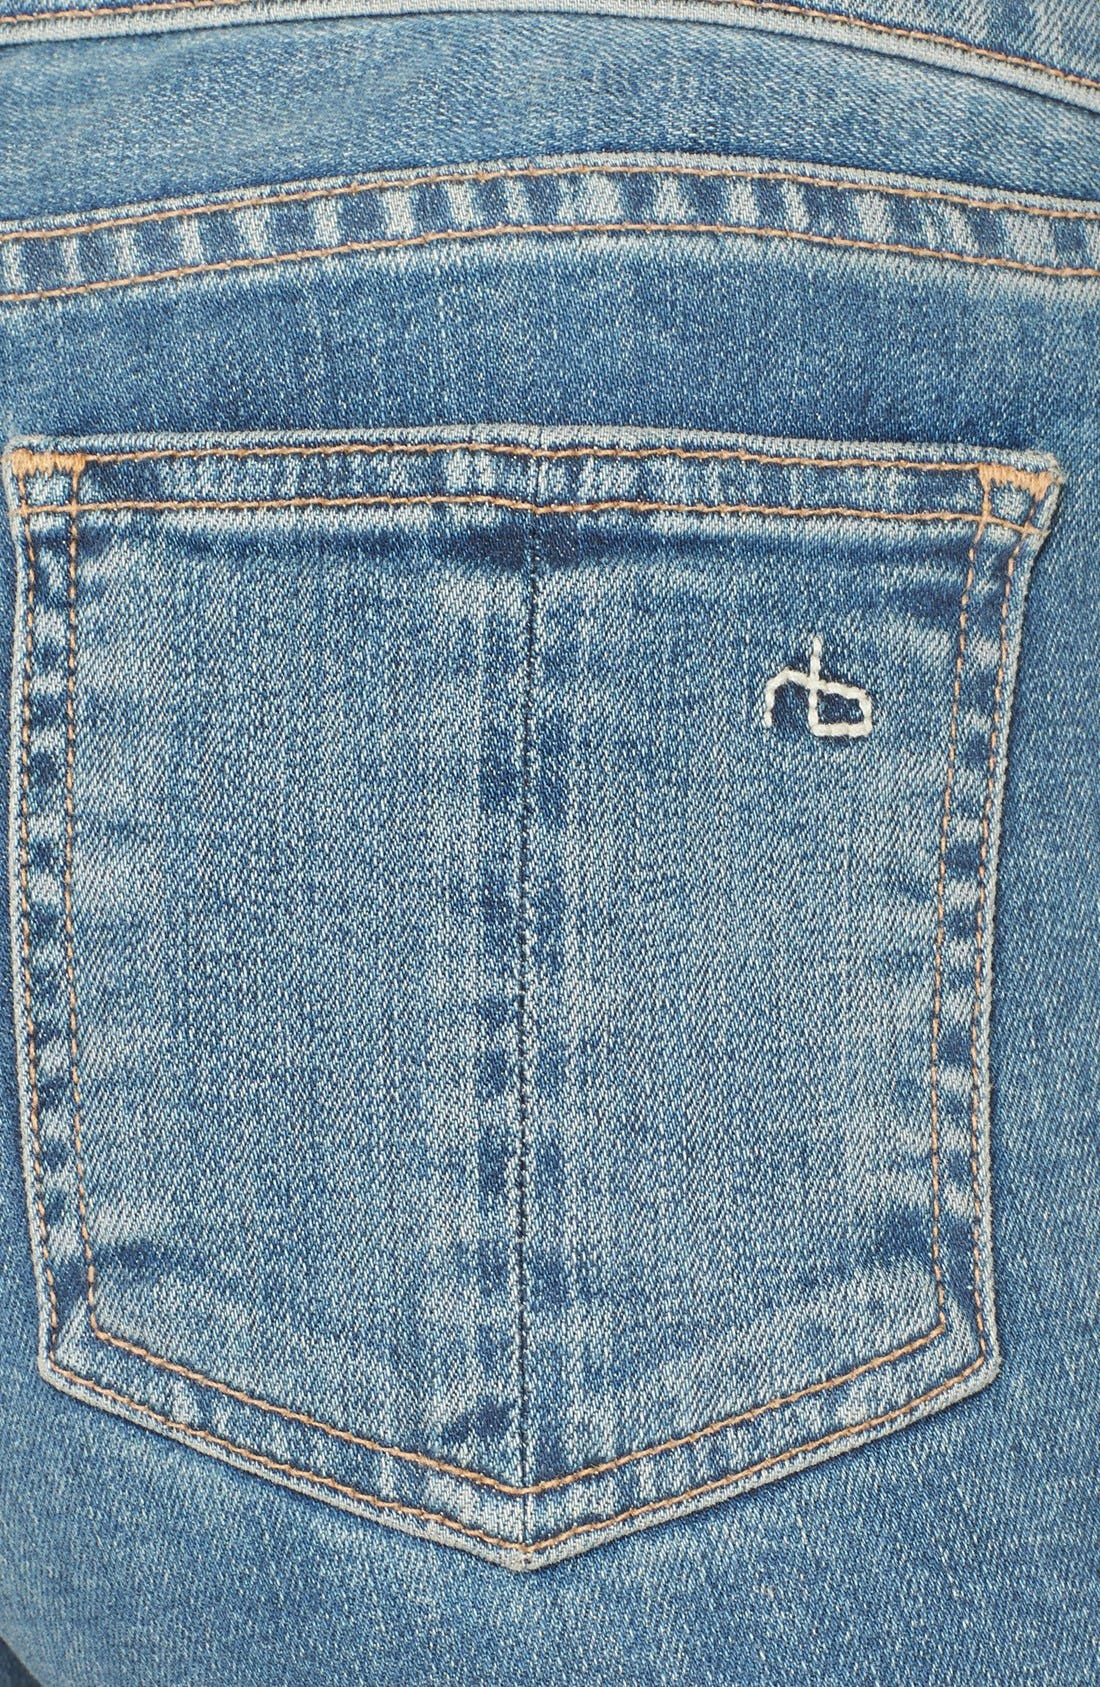 Alternate Image 3  - rag & bone/JEAN Stretch Skinny Jeans (Water Street)